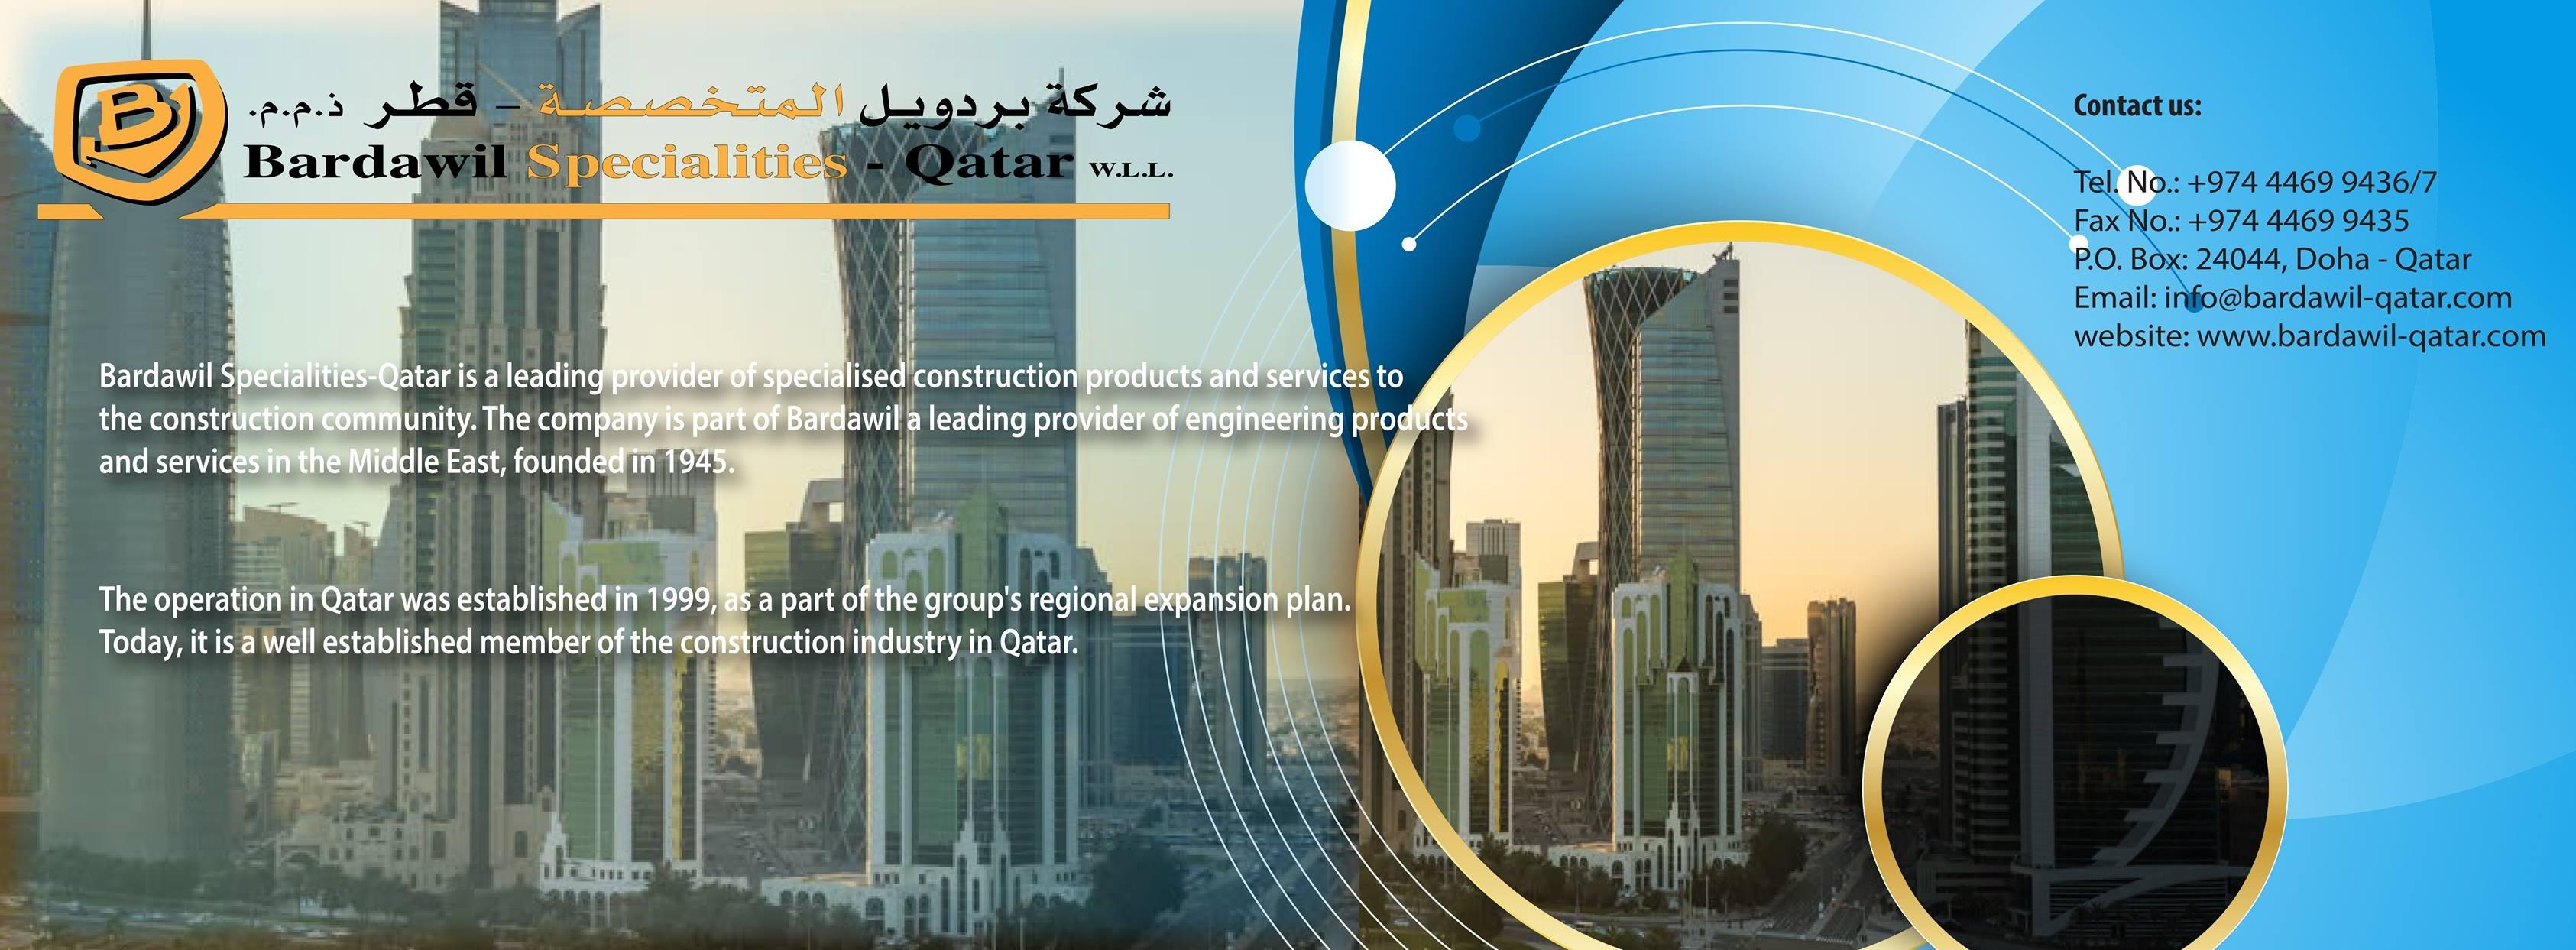 Bardawil Specialites Qatar WLL   LinkedIn